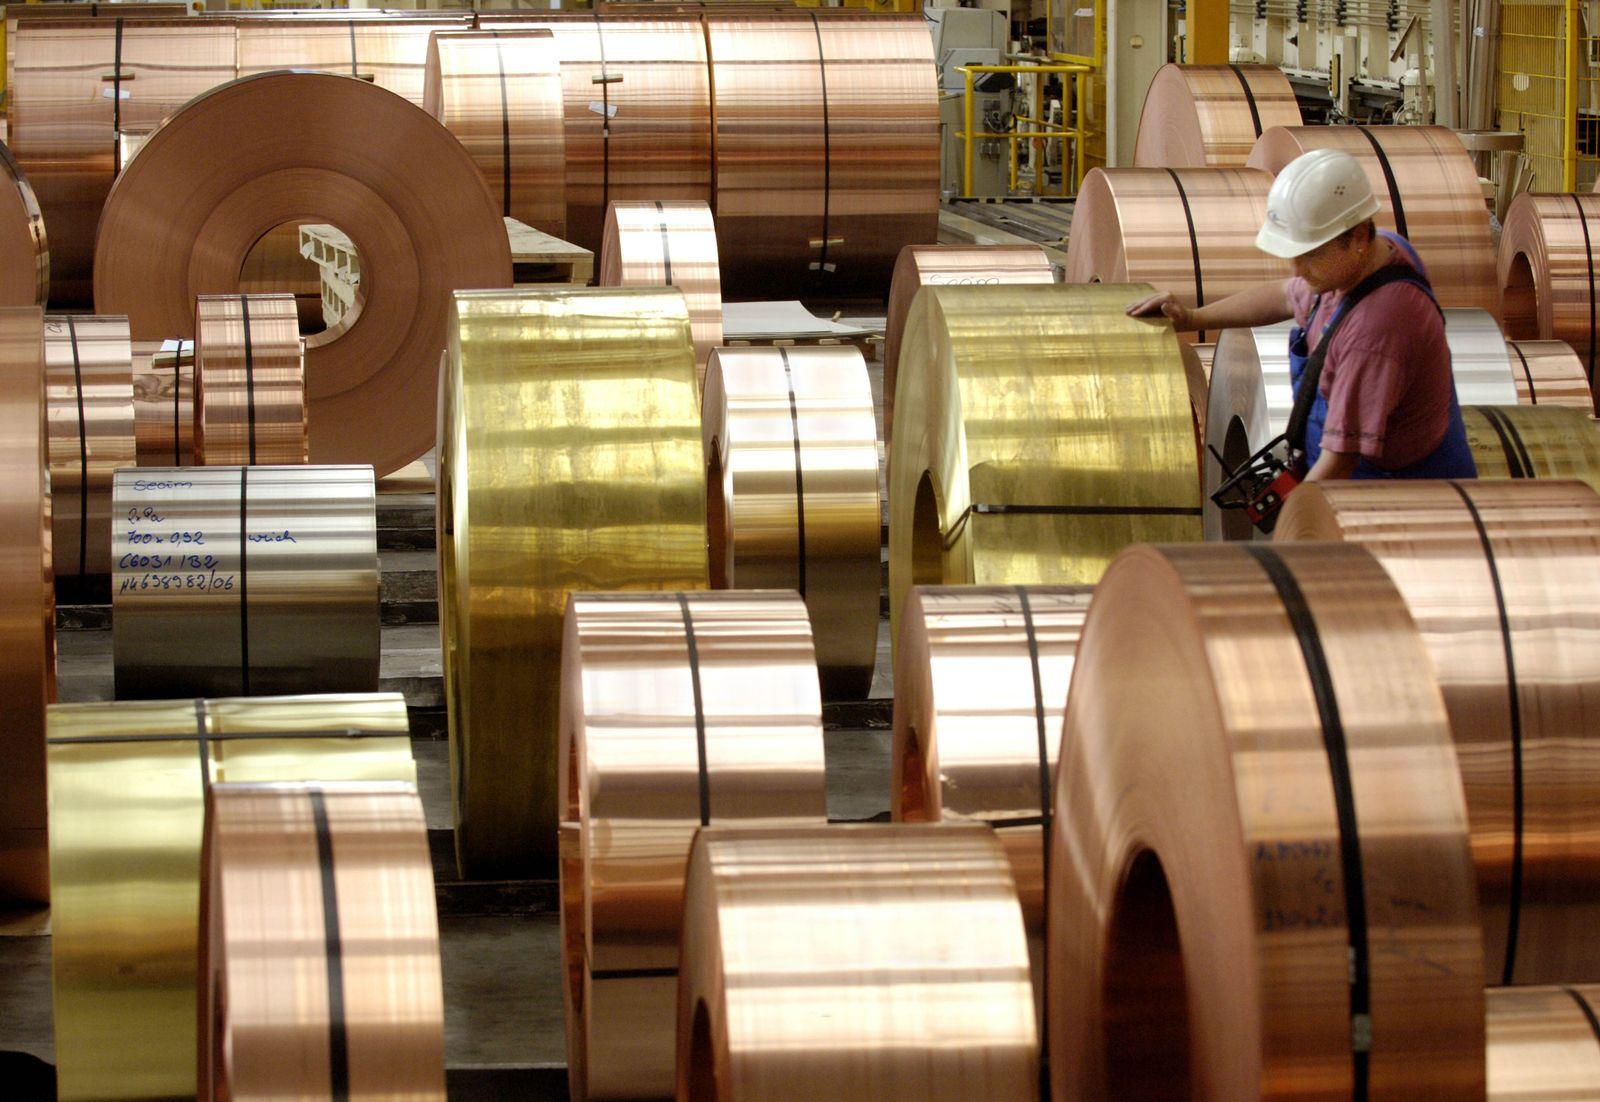 Modernes Kupferhalbzeugwerk in Hettstedt